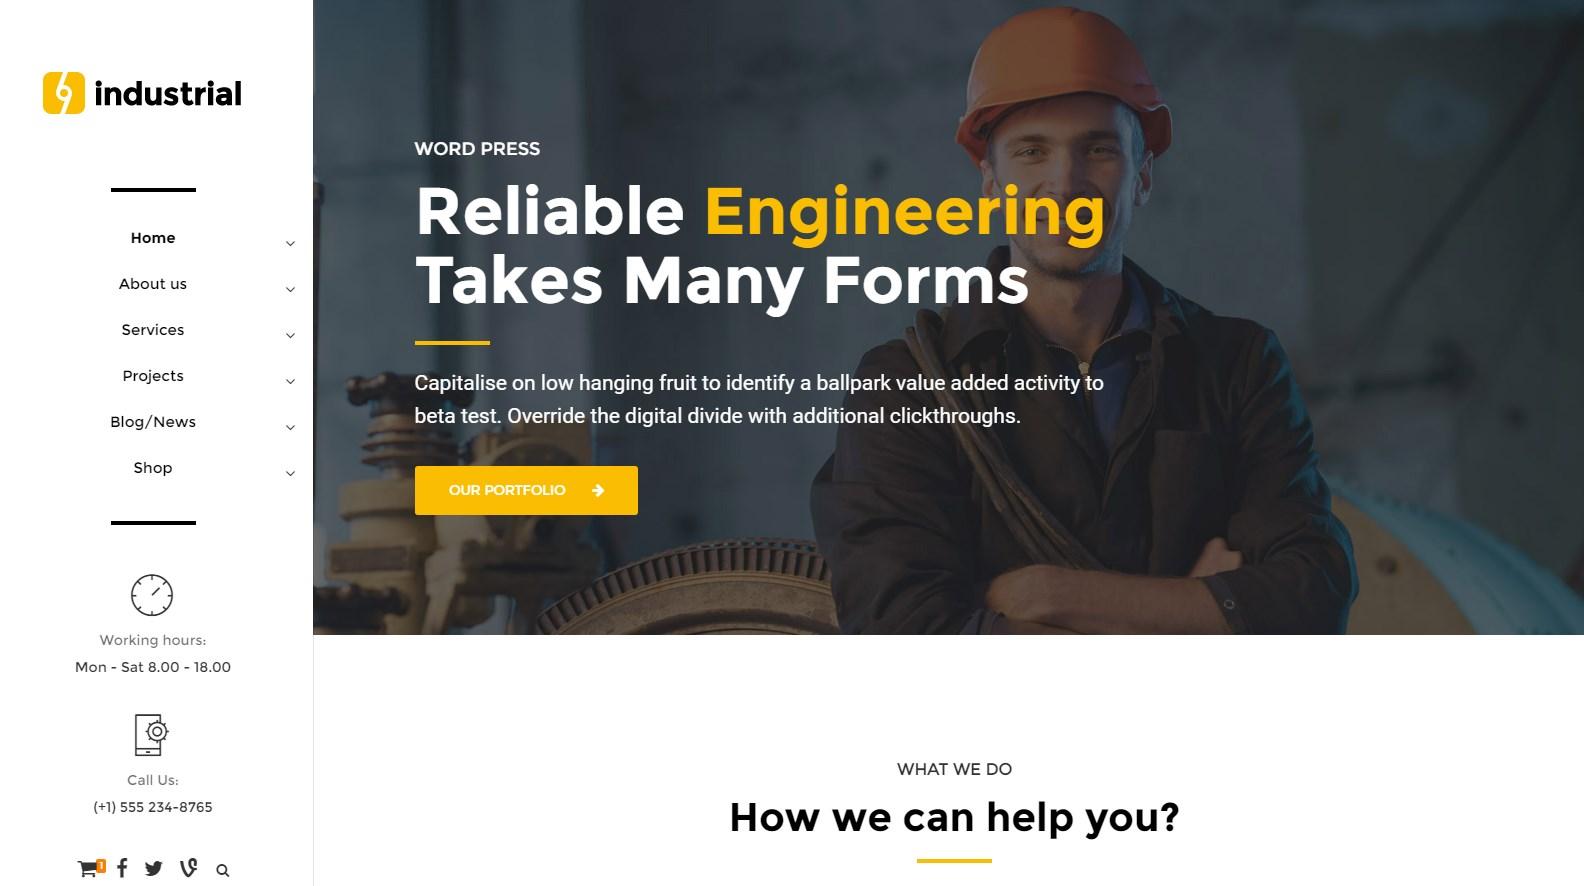 https://documentation.bold-themes.com/industrial/wp-content/uploads/sites/8/2016/09/vleft.jpg